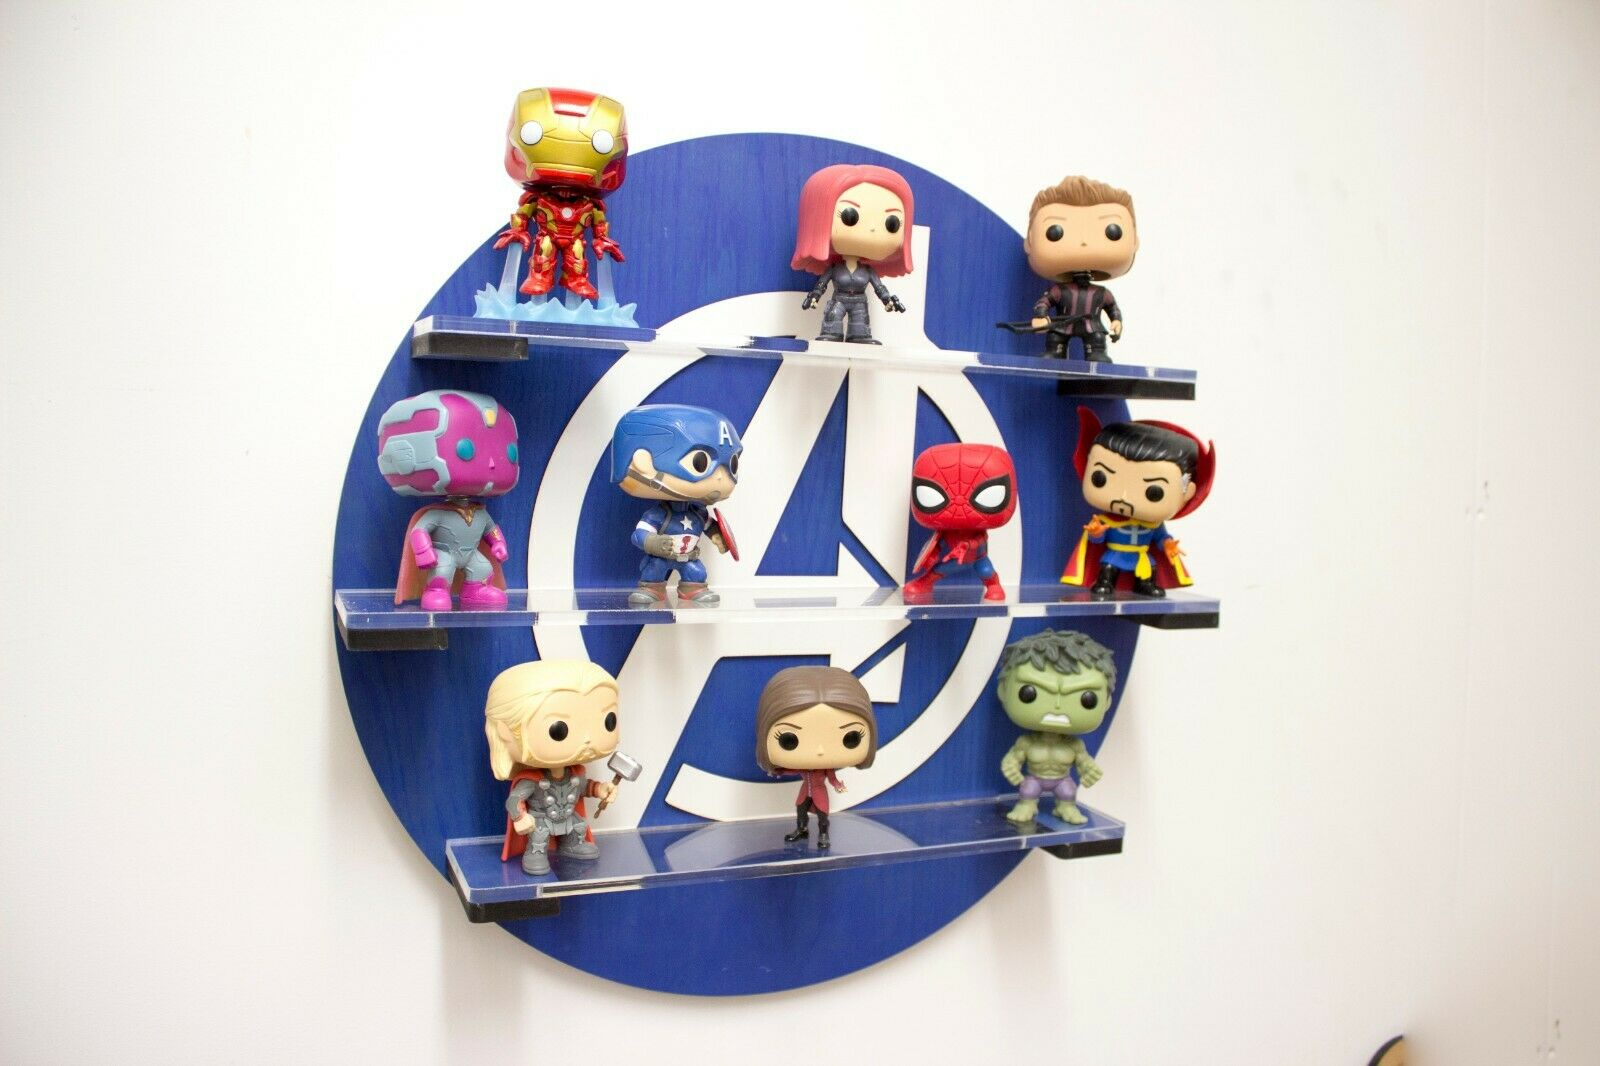 Avengers Pop vinyl display Shelf Blau